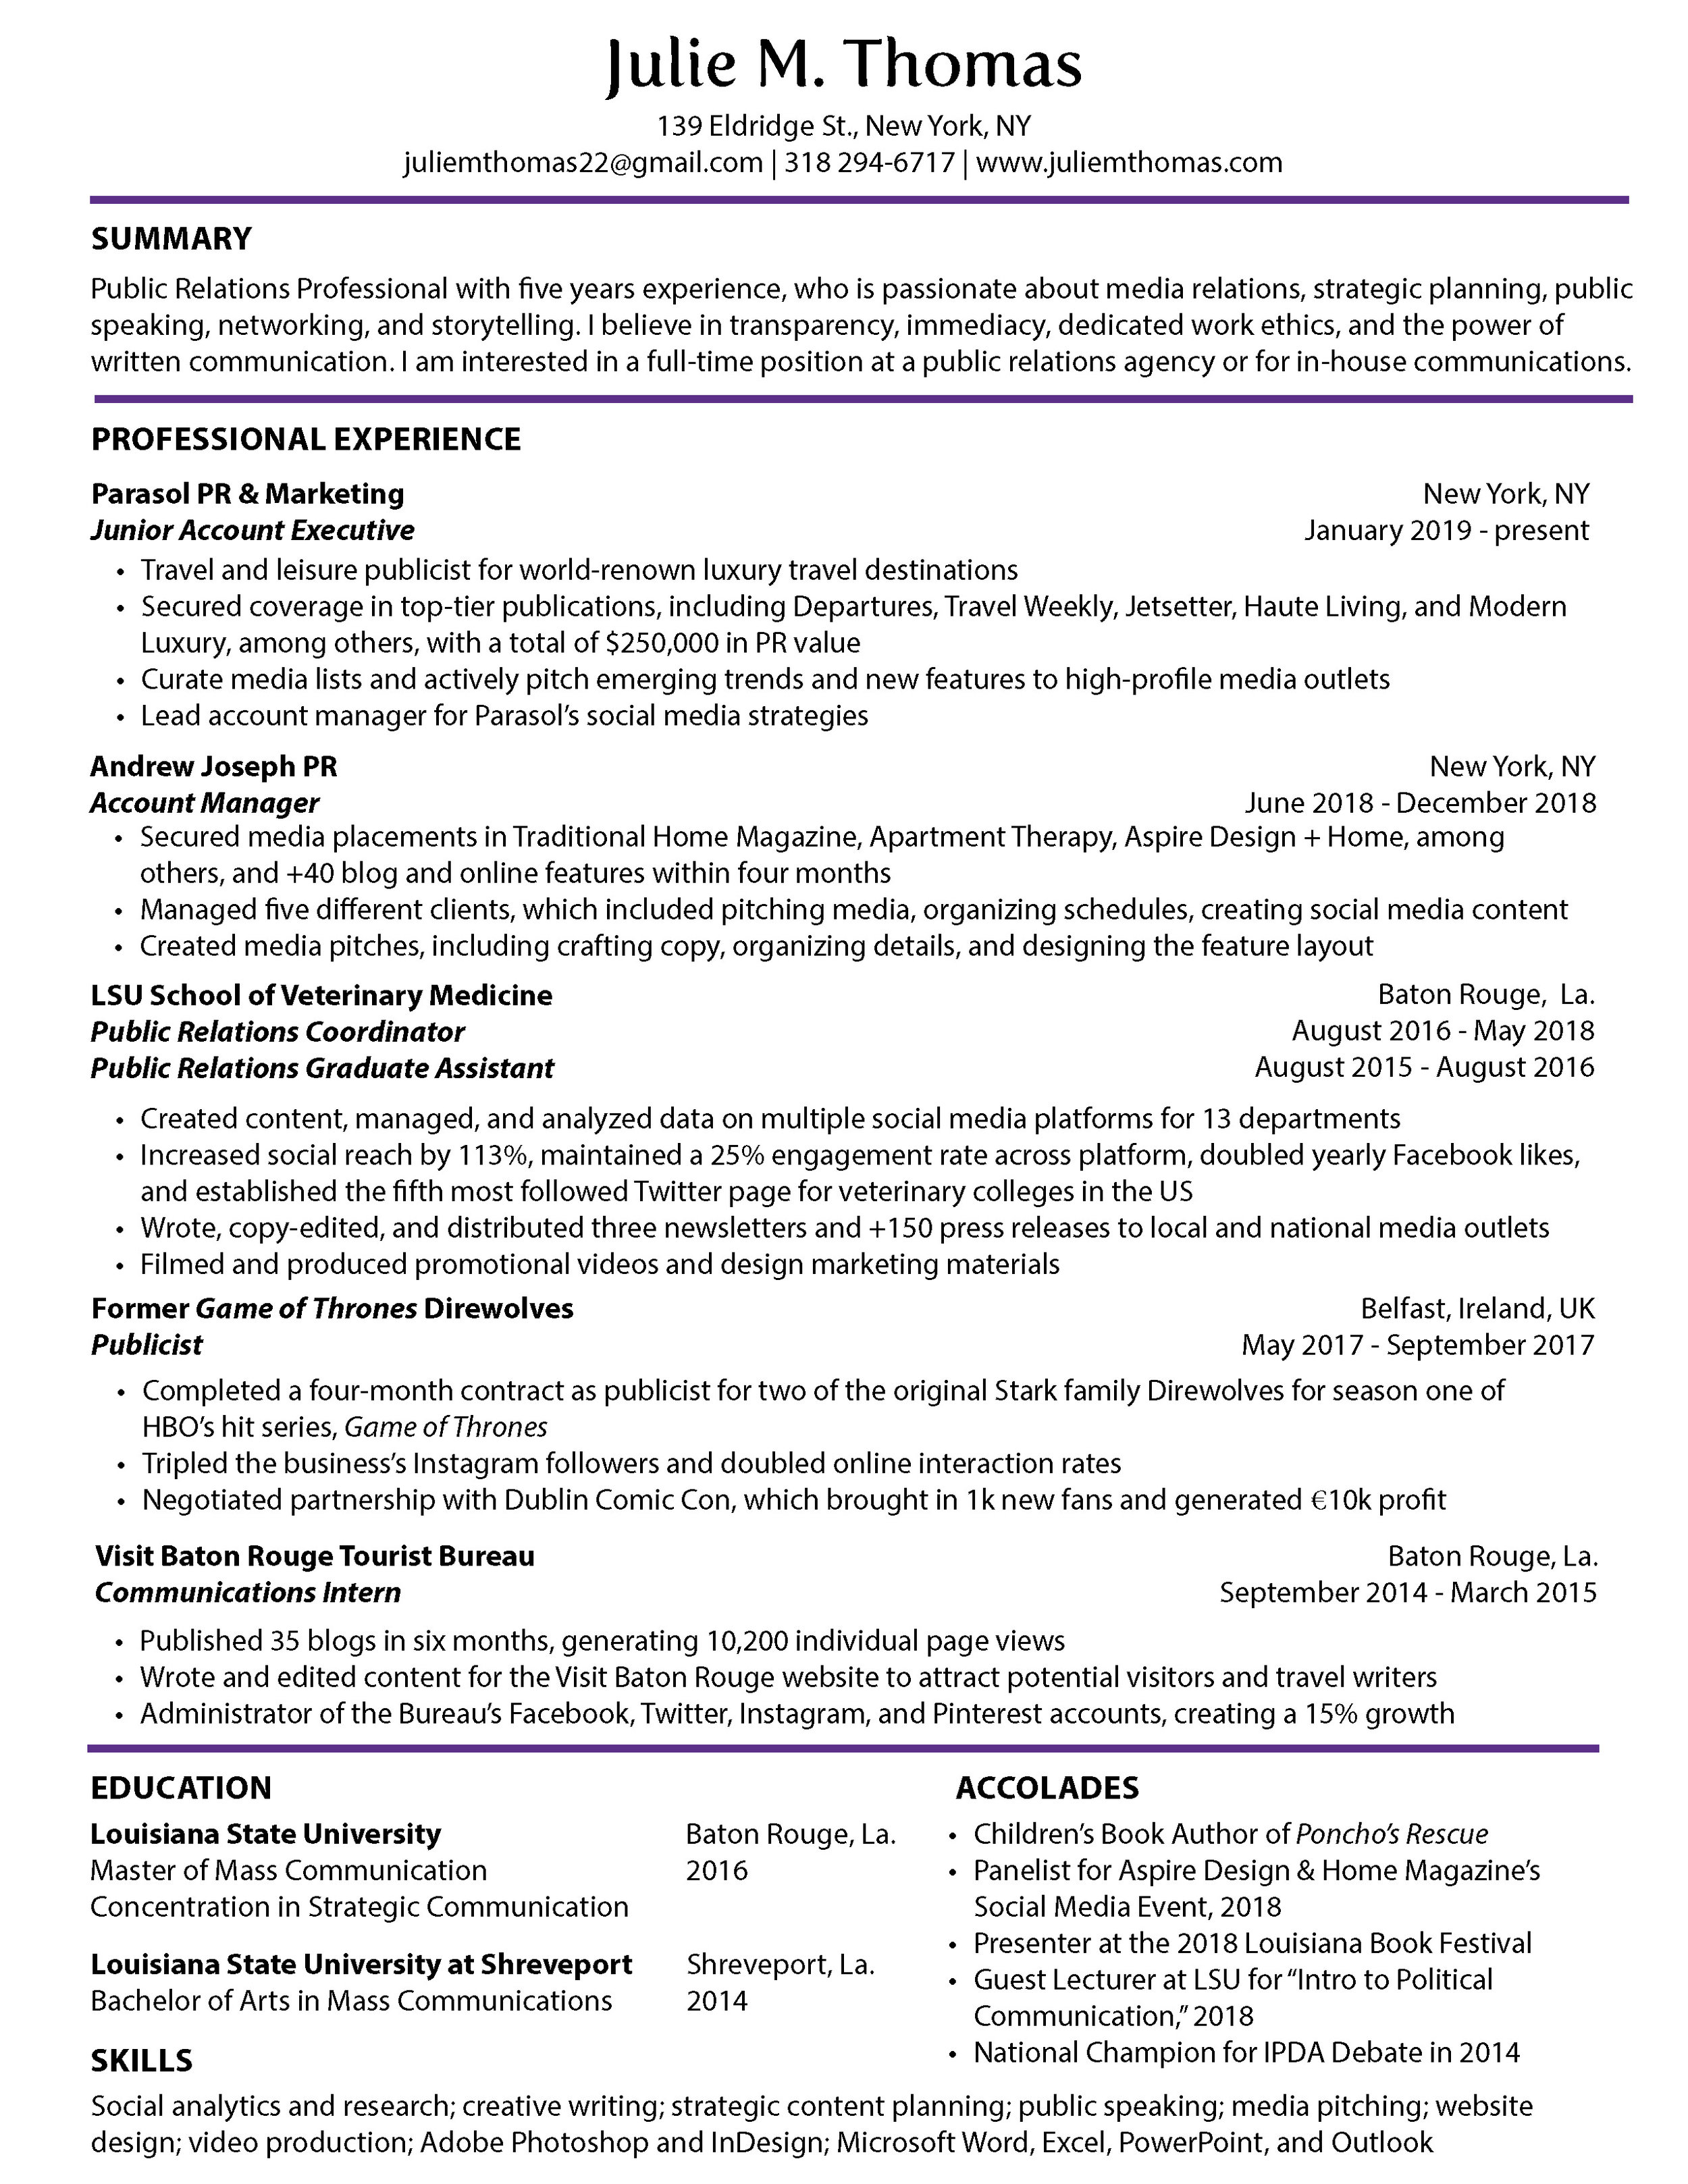 Julie M. Thomas Resume .jpg